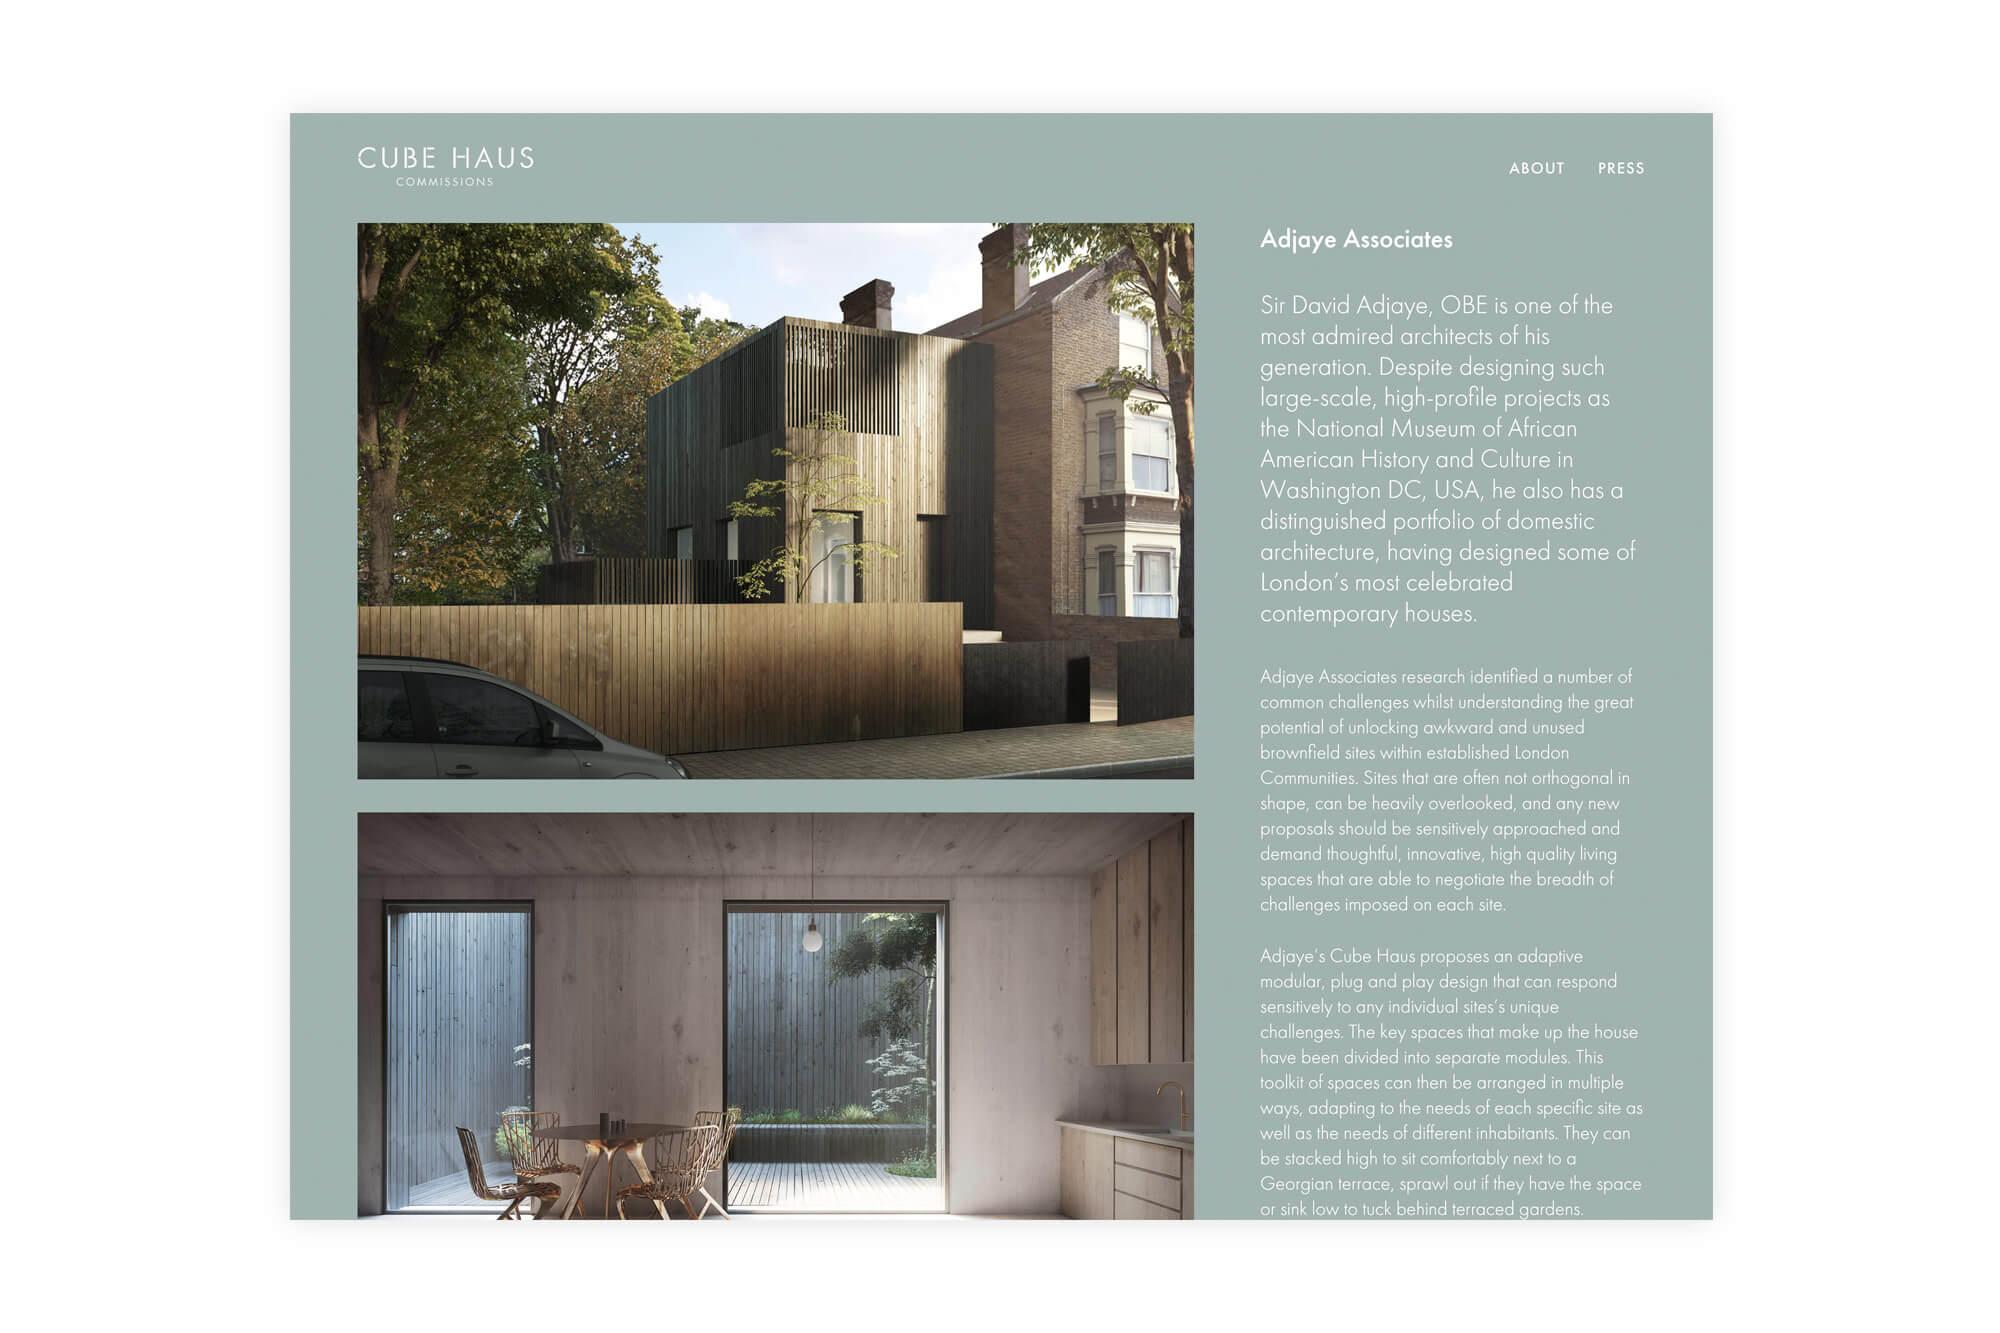 gpj-studio-cube-haus-architects-website-cs-03